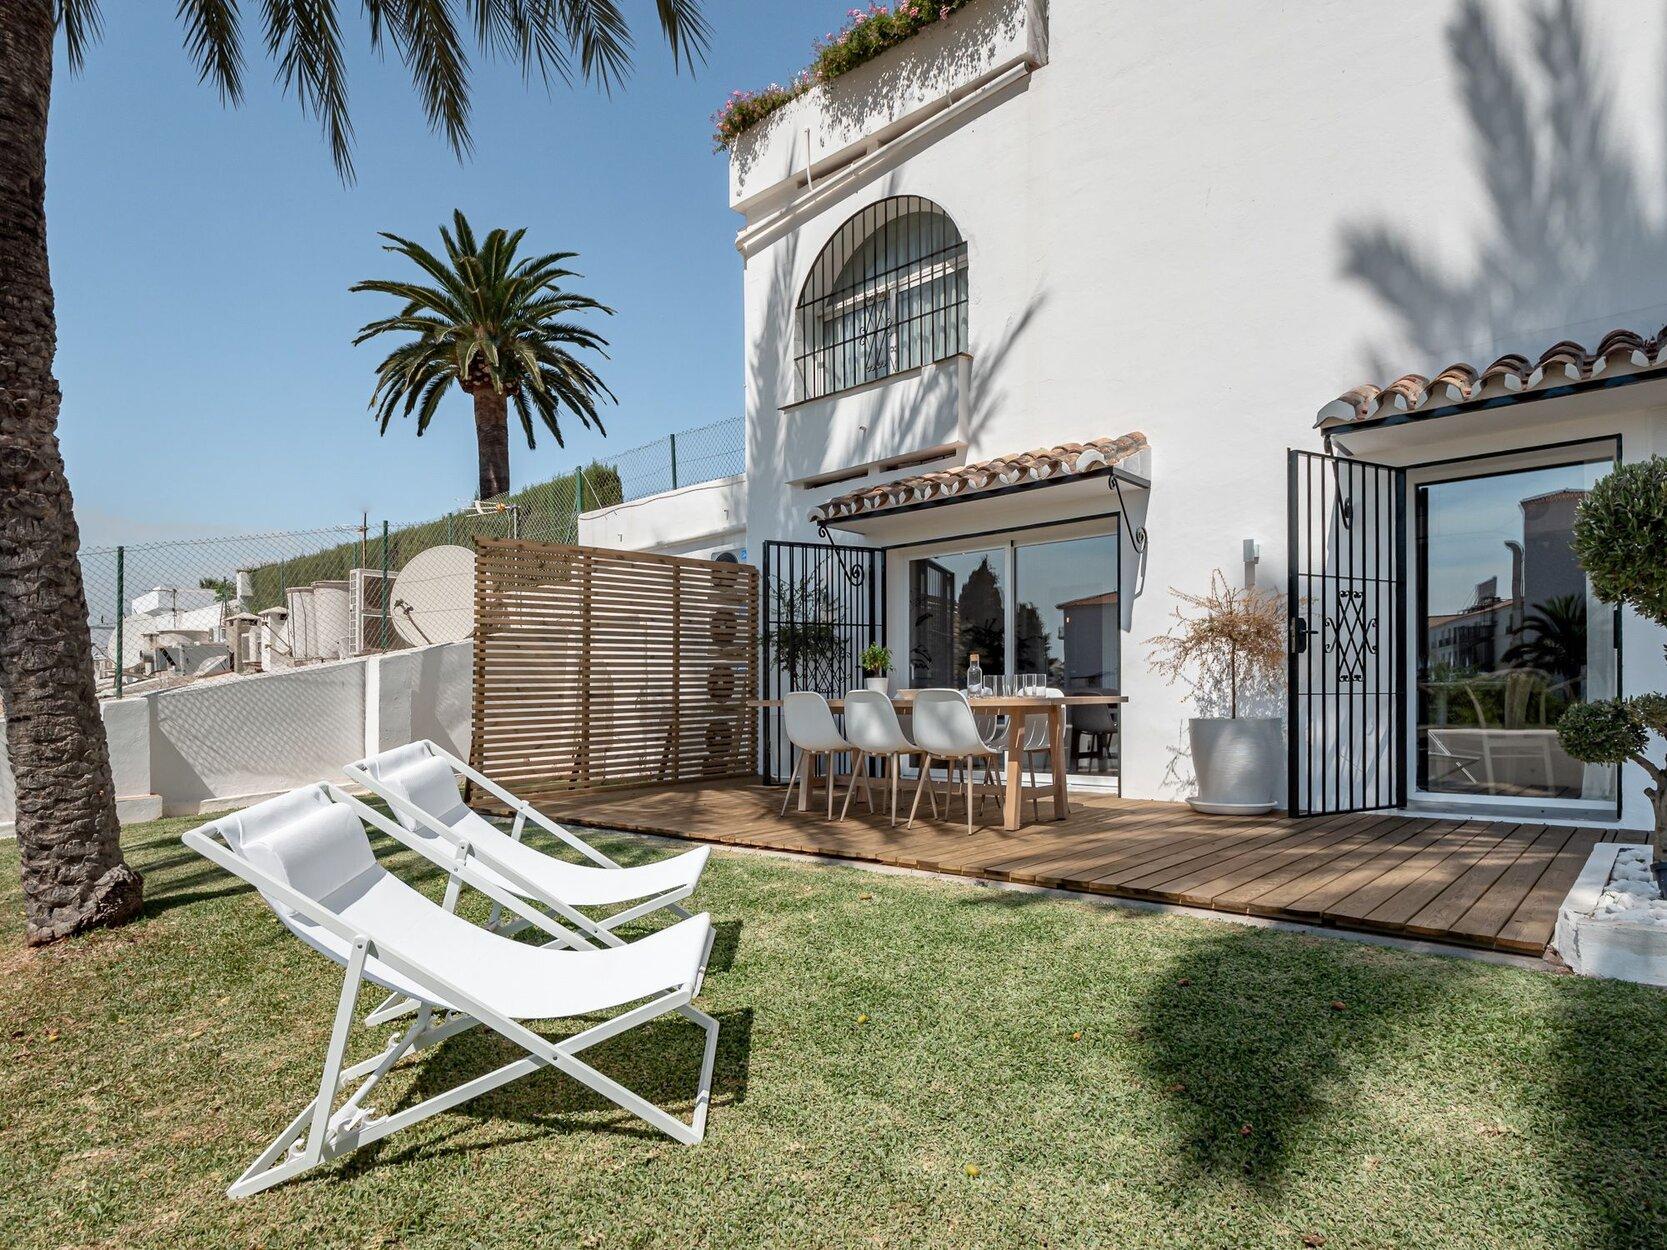 Apartment for sale in Marbella, Andalucia Garden Club